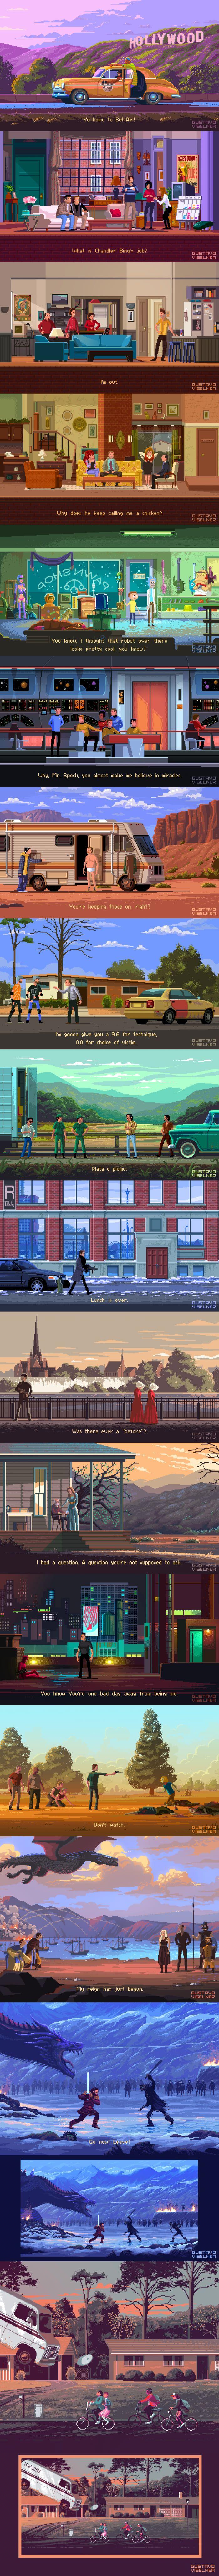 Pixel artists creates Adventure Game Scenes Based On Tv Series!